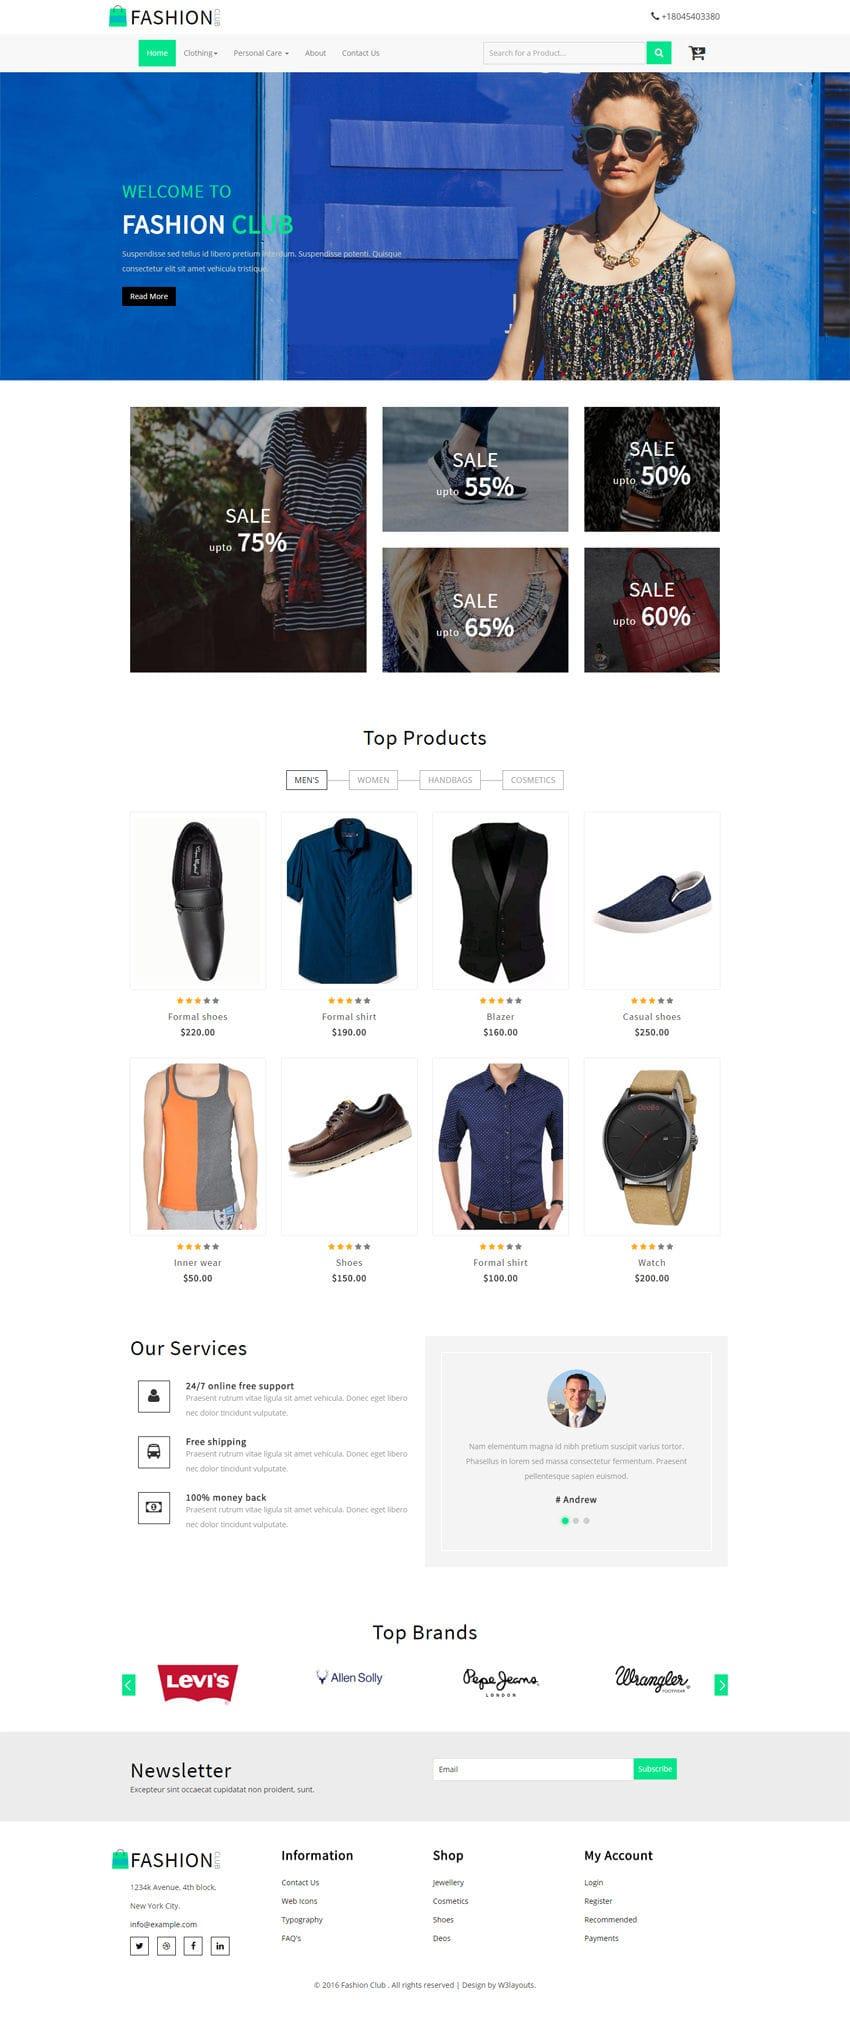 Top e commerce fashion websites Top Seven E-Commerce Platforms in 2018 m